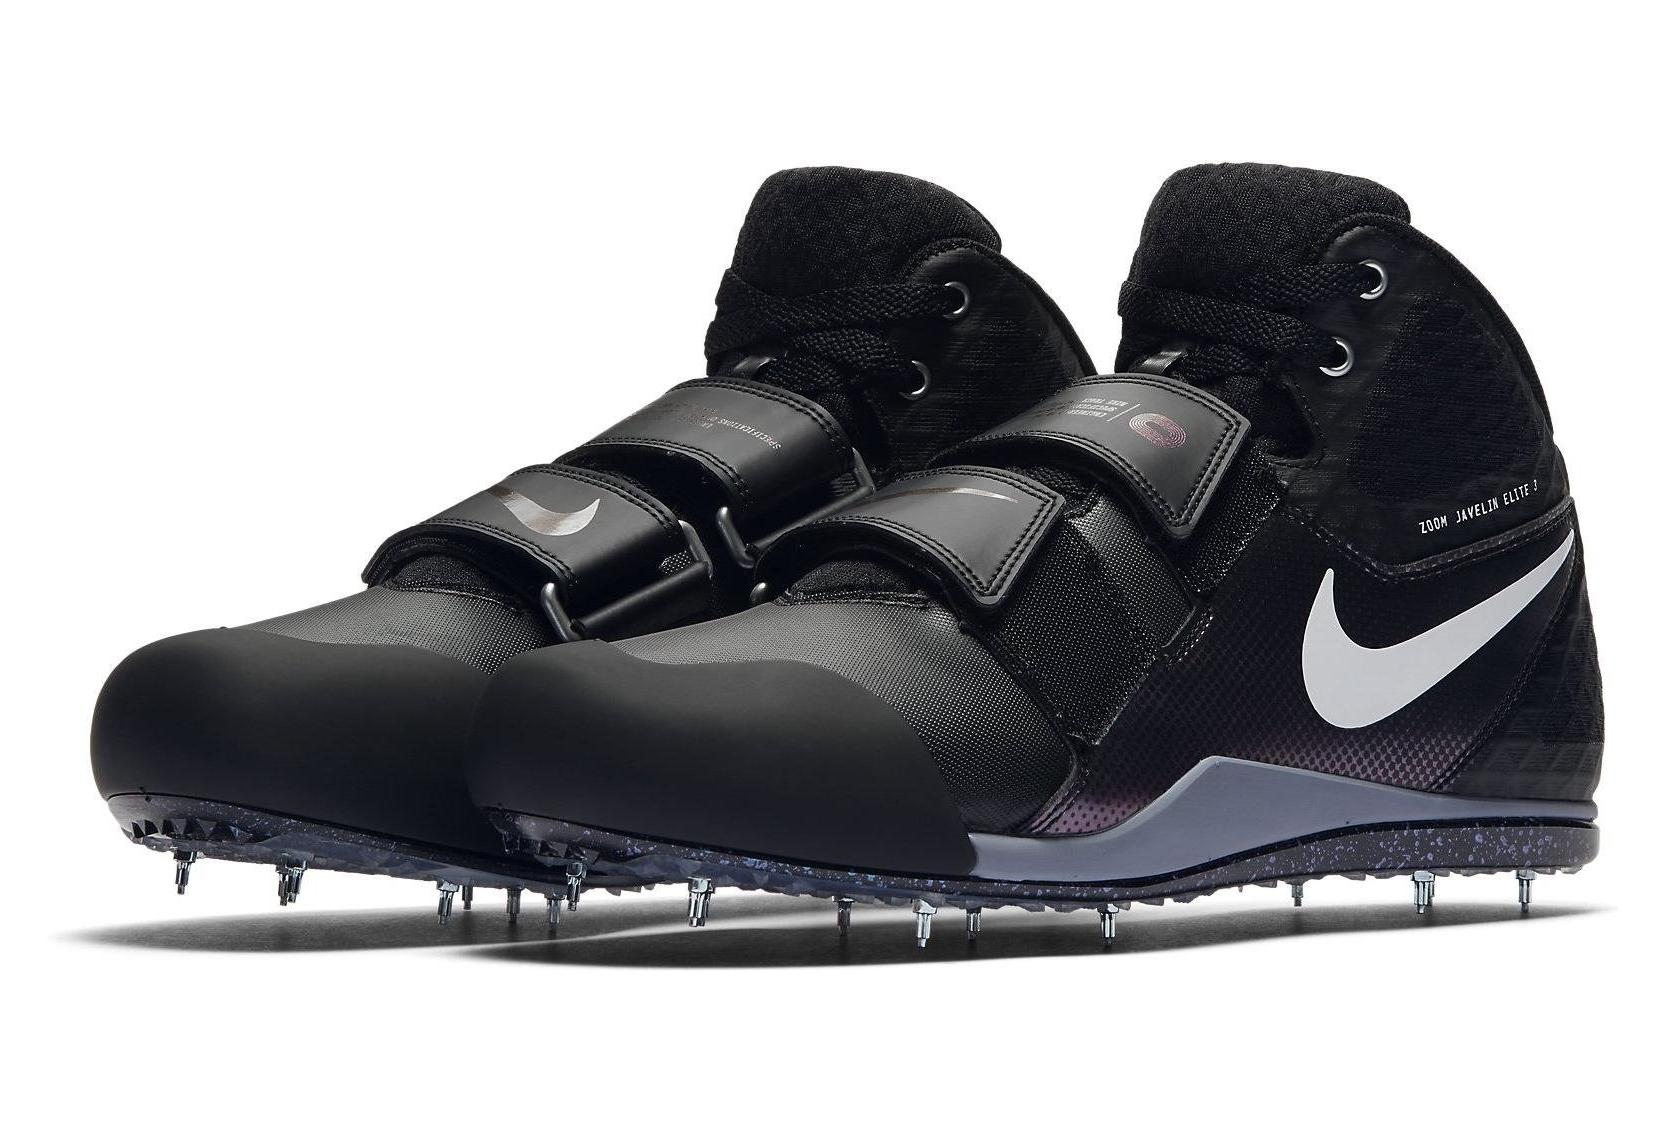 Nike Zoom Javelin Elite 3 Black White